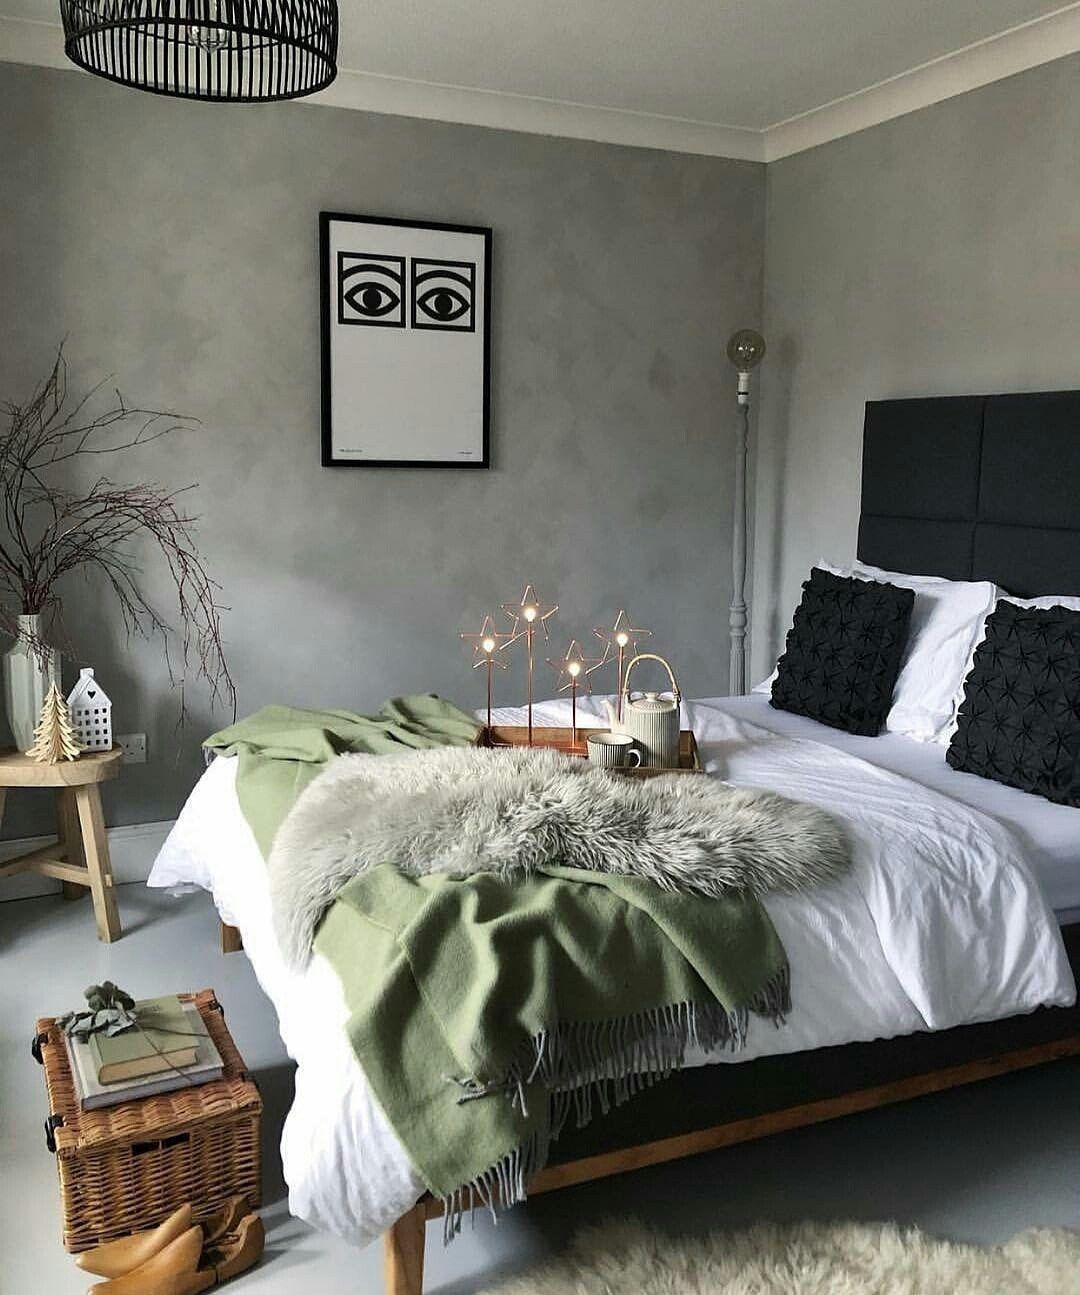 Bedroom Inspiration Mynordicroom Bedroom Inspirations Home